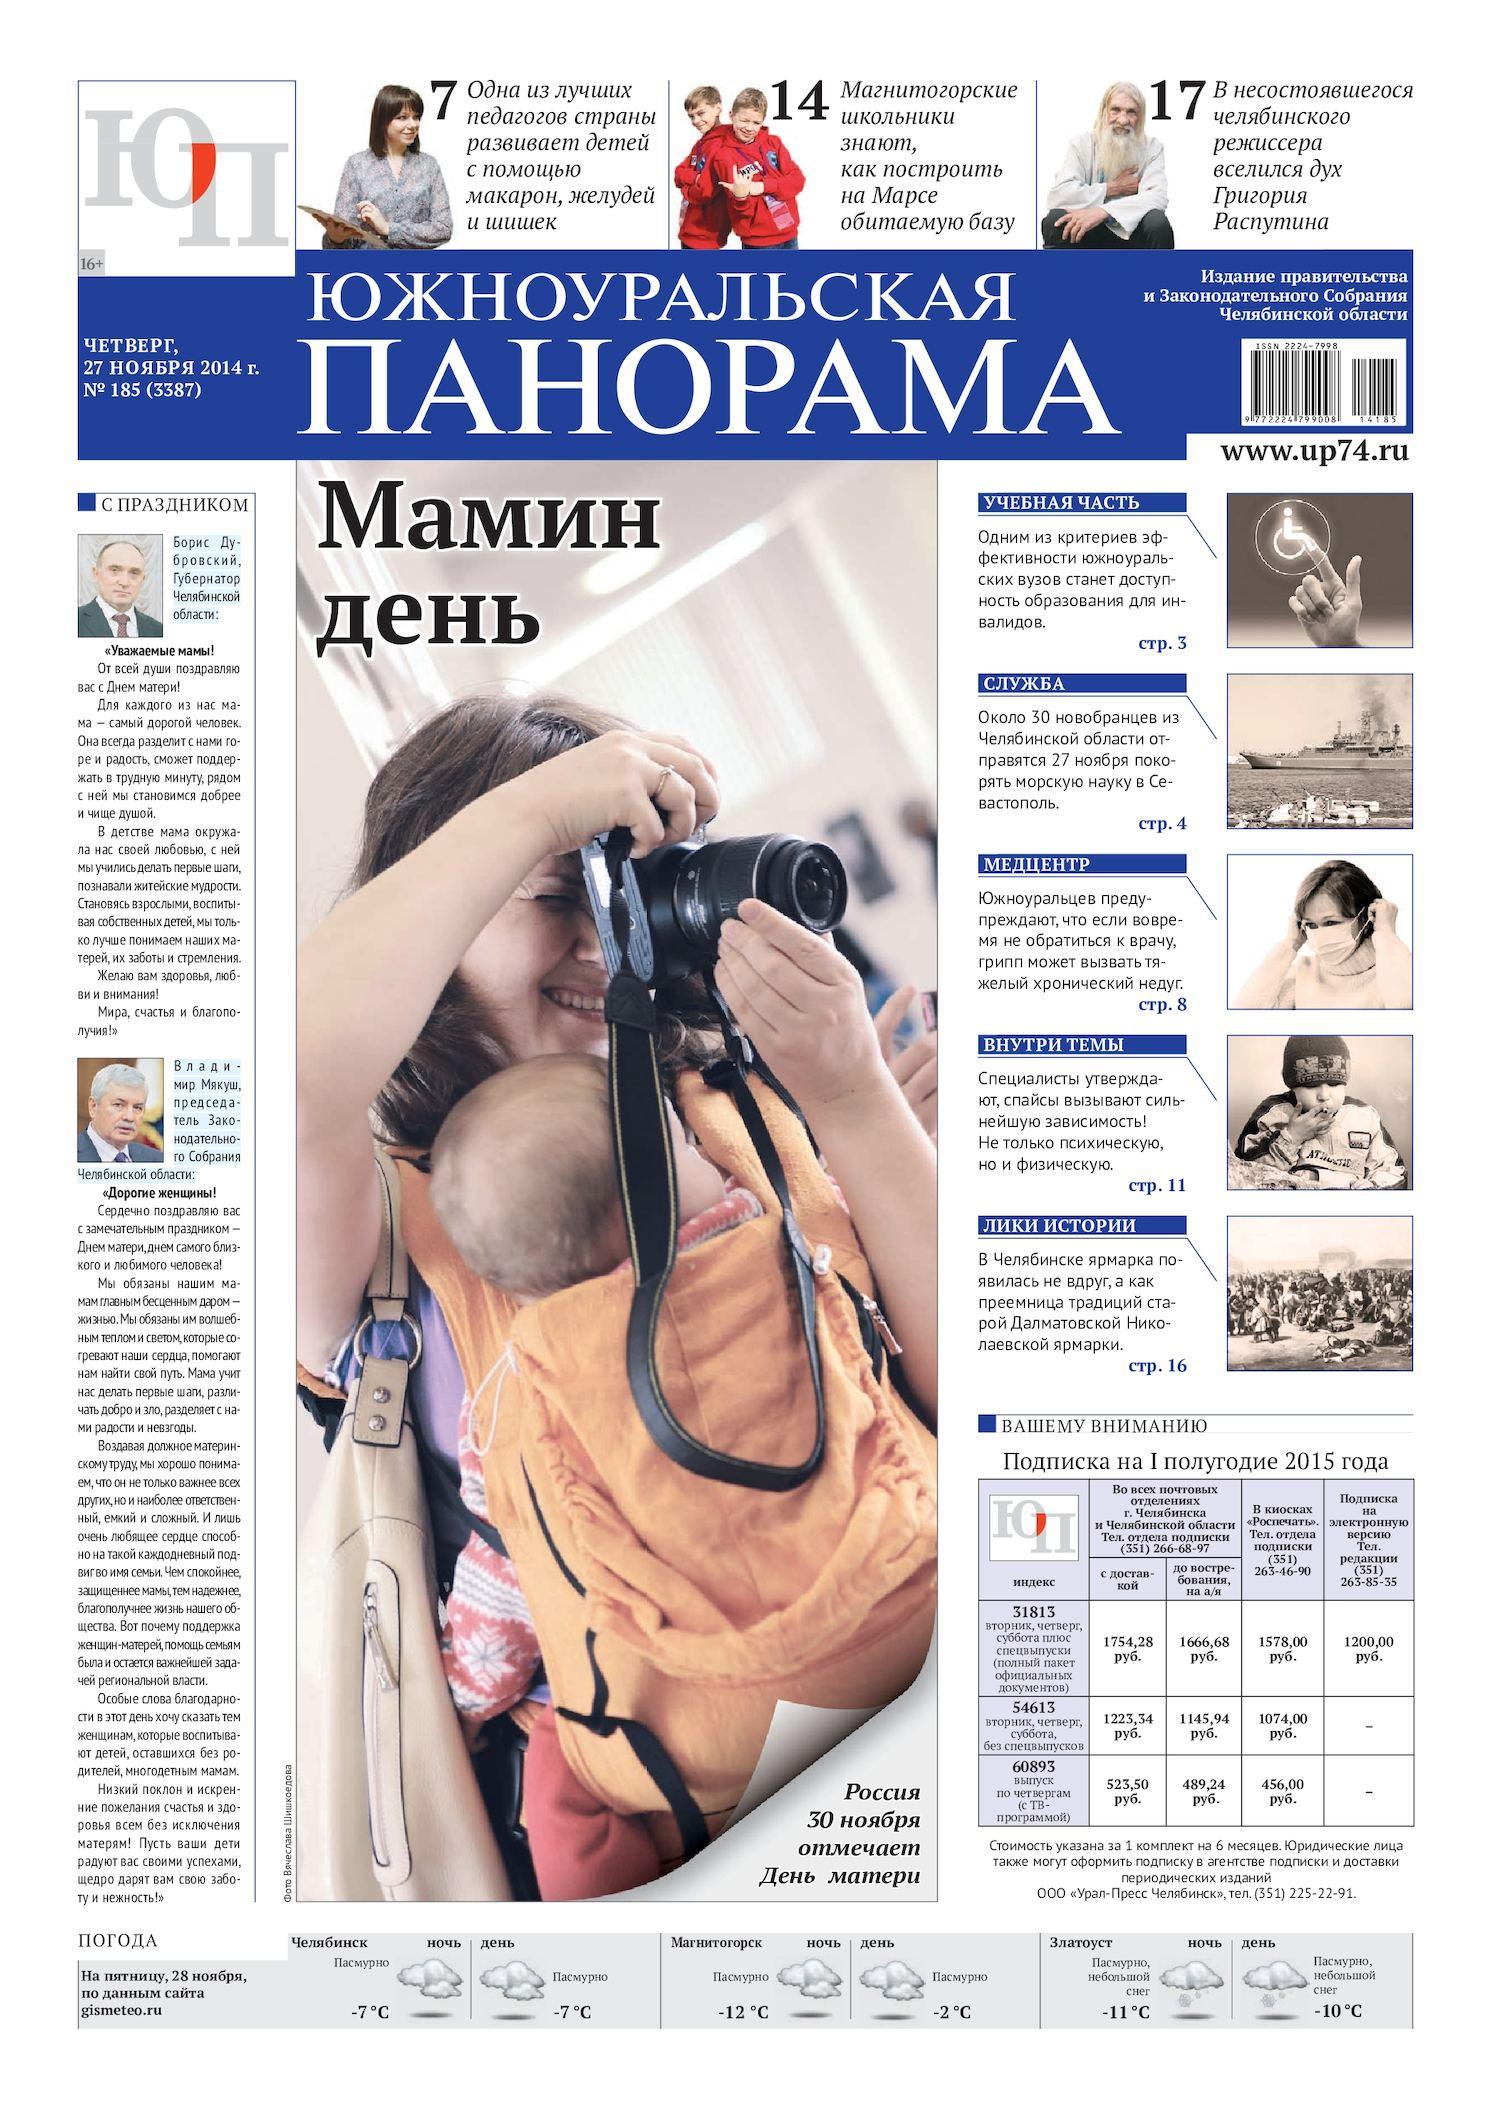 Дарья Савельева Надевает Штаны – Комбинат «Надежда» (2014)